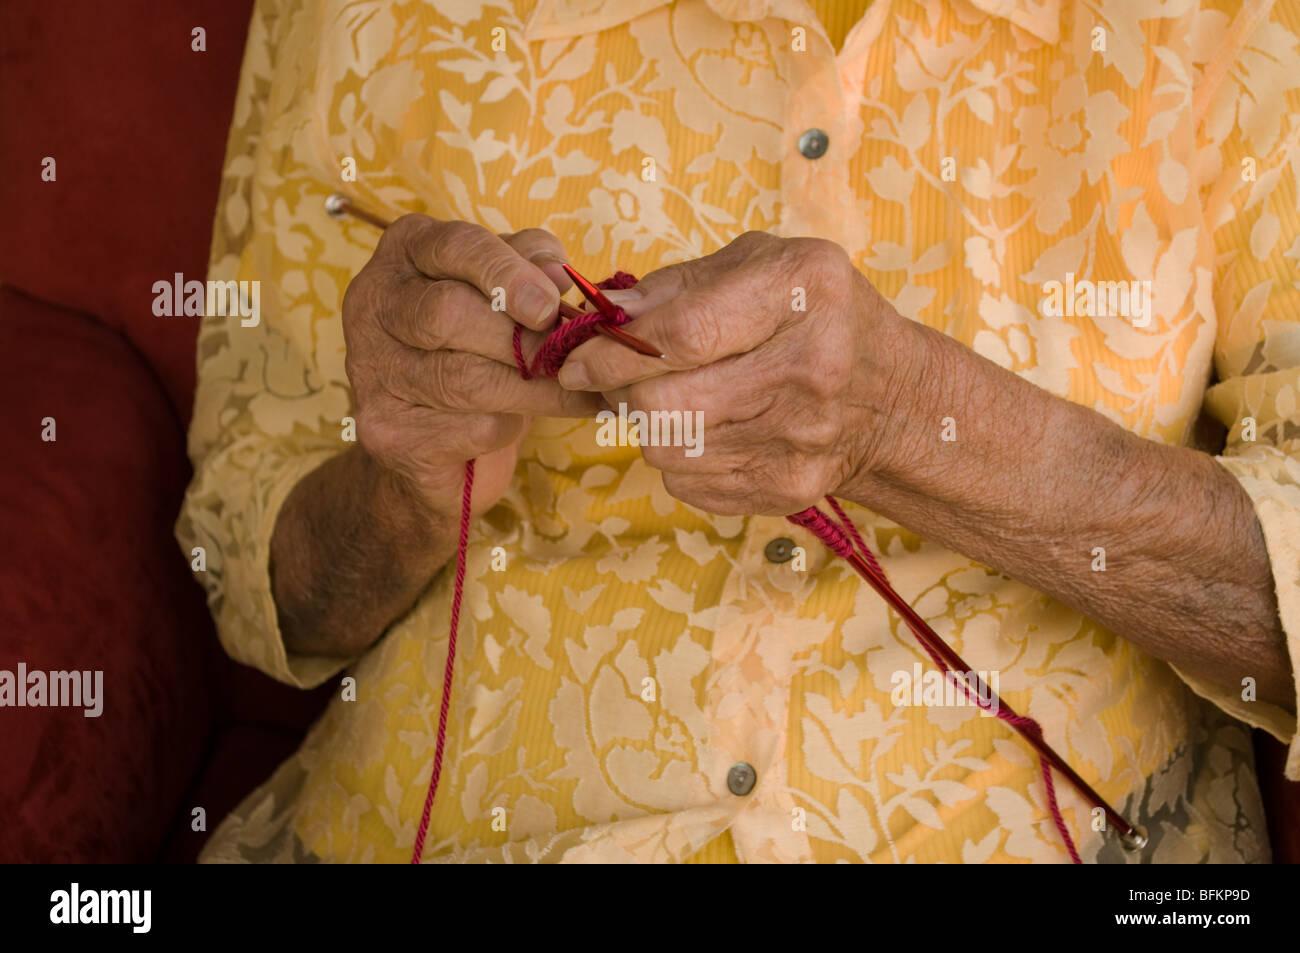 elderly caucasian woman knitting with burgandy wool yarn - Stock Image